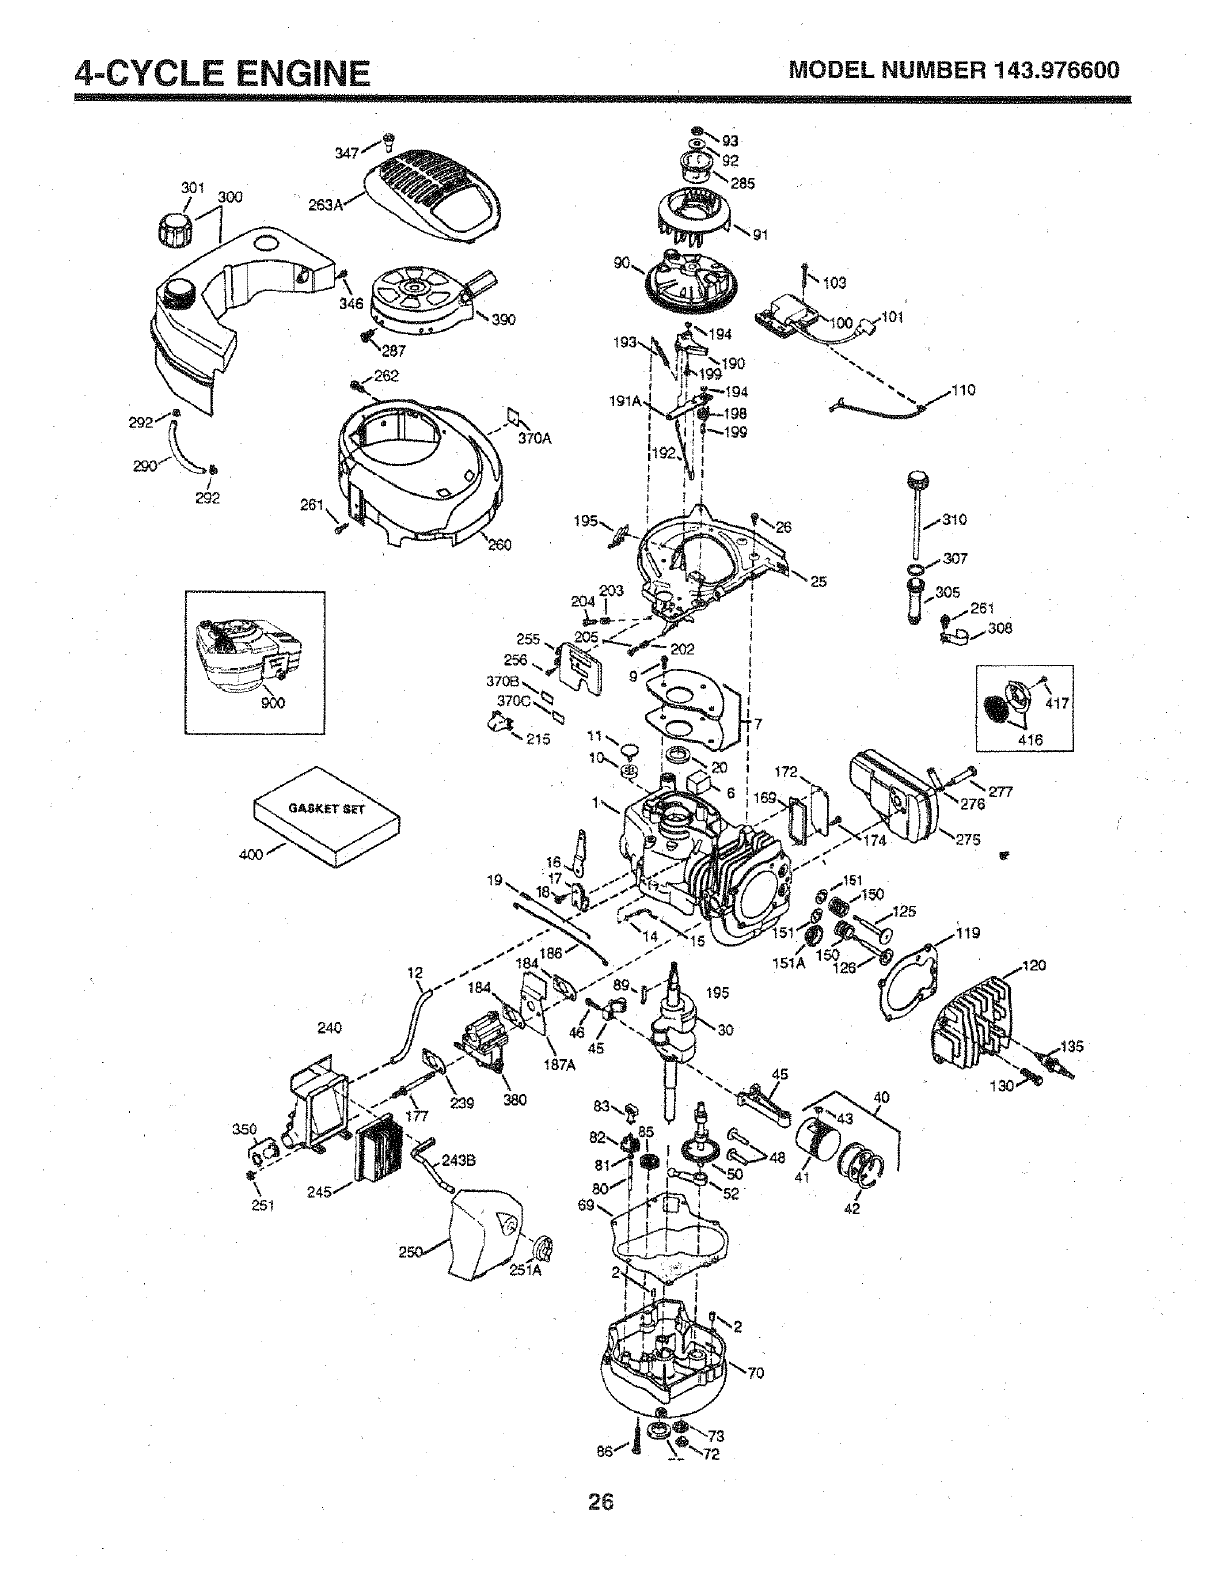 Page 26 of Craftsman Lawn Mower User Manual